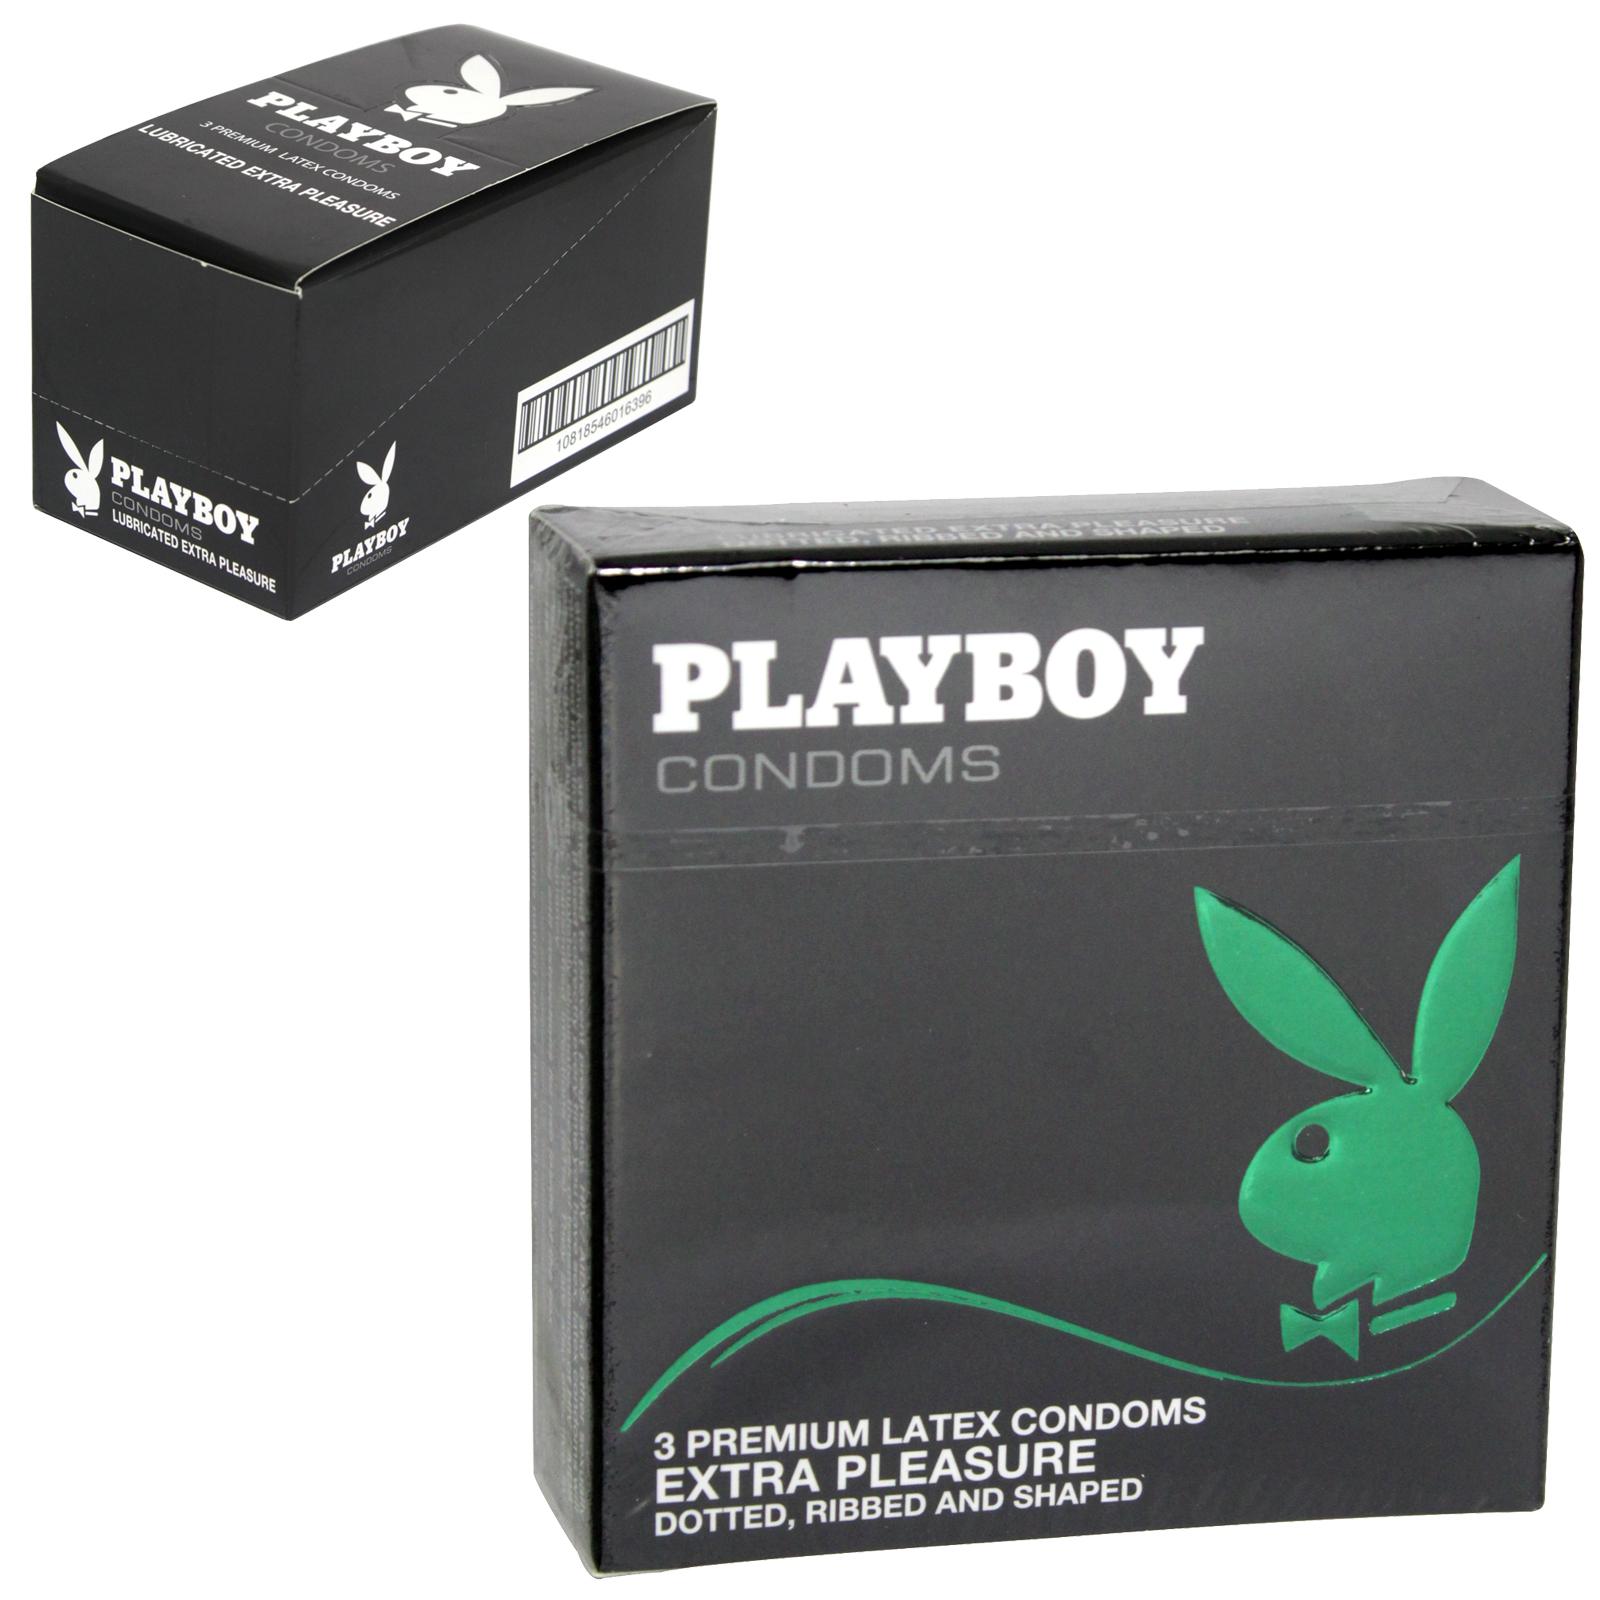 PLAYBOY CONDOMS 3S EXTRA PLEASURE ASS X6